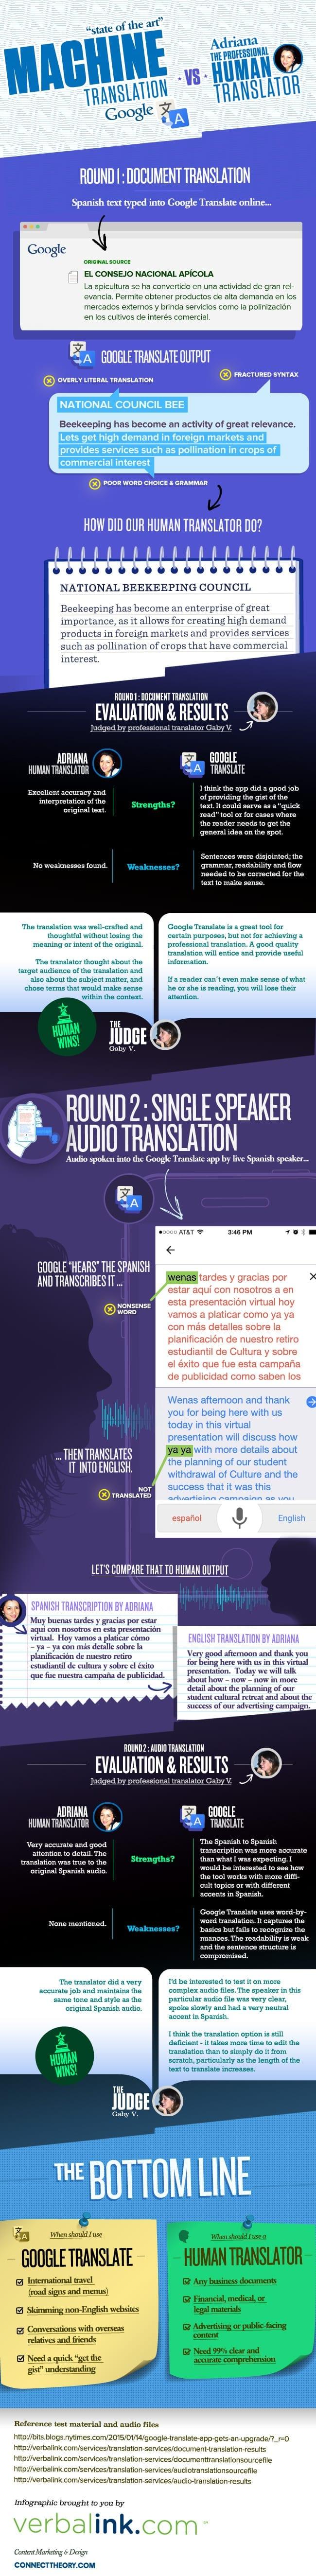 verbal-ink-translation-infographic-final1